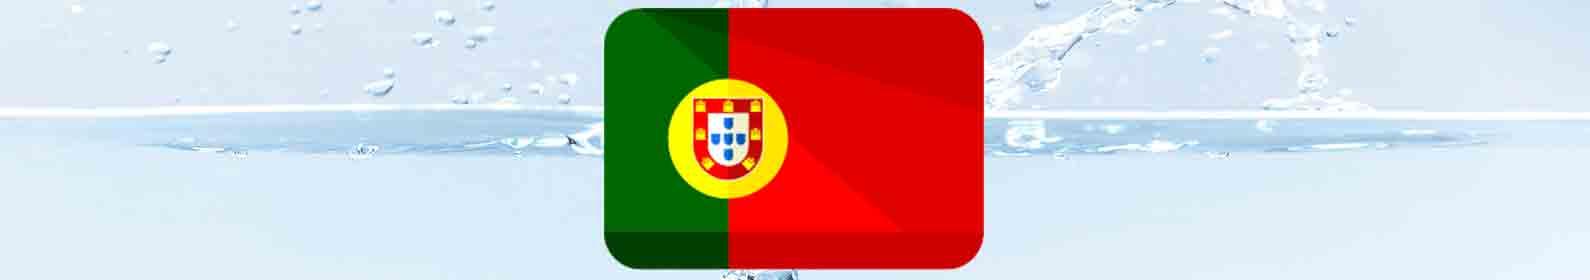 tratamento-de-agua-portugal.jpg